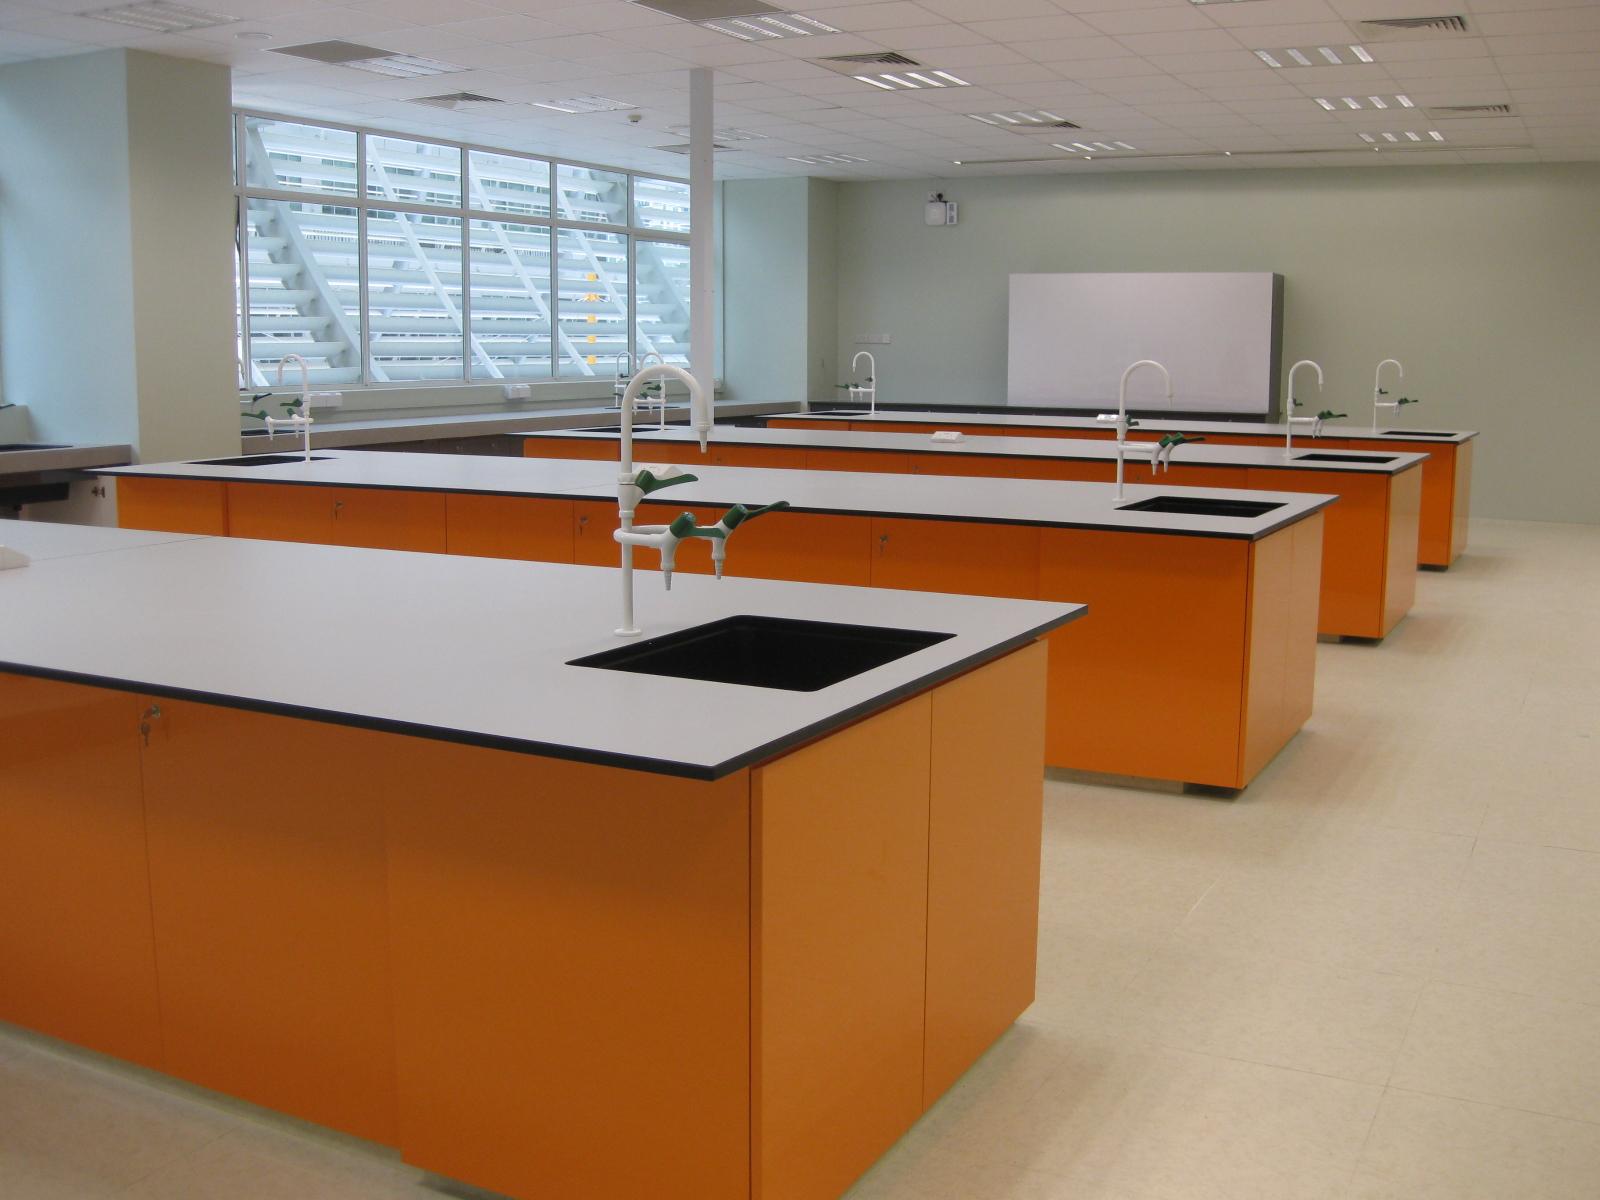 Lab Photo 004.jpg